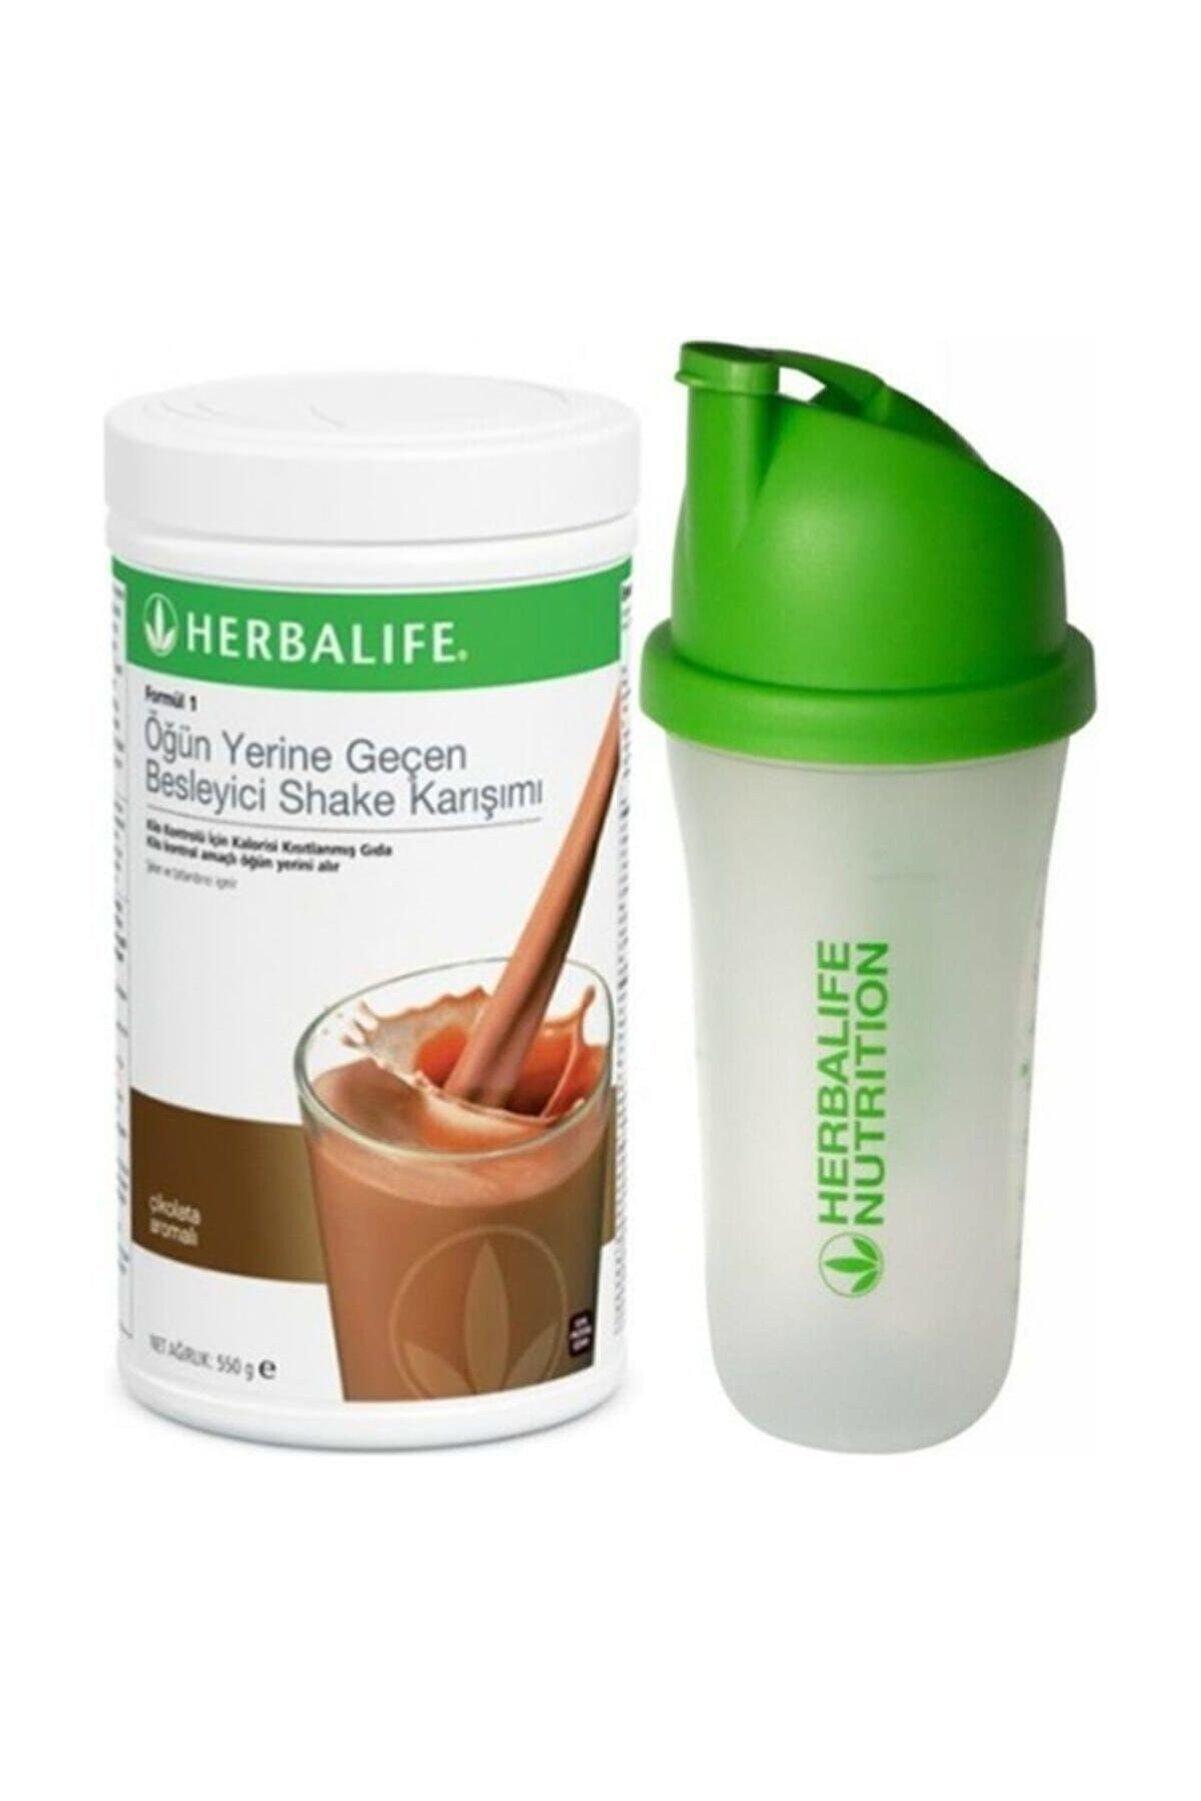 Herbalife Formül 1 Shake 550gr. 1 Shaker